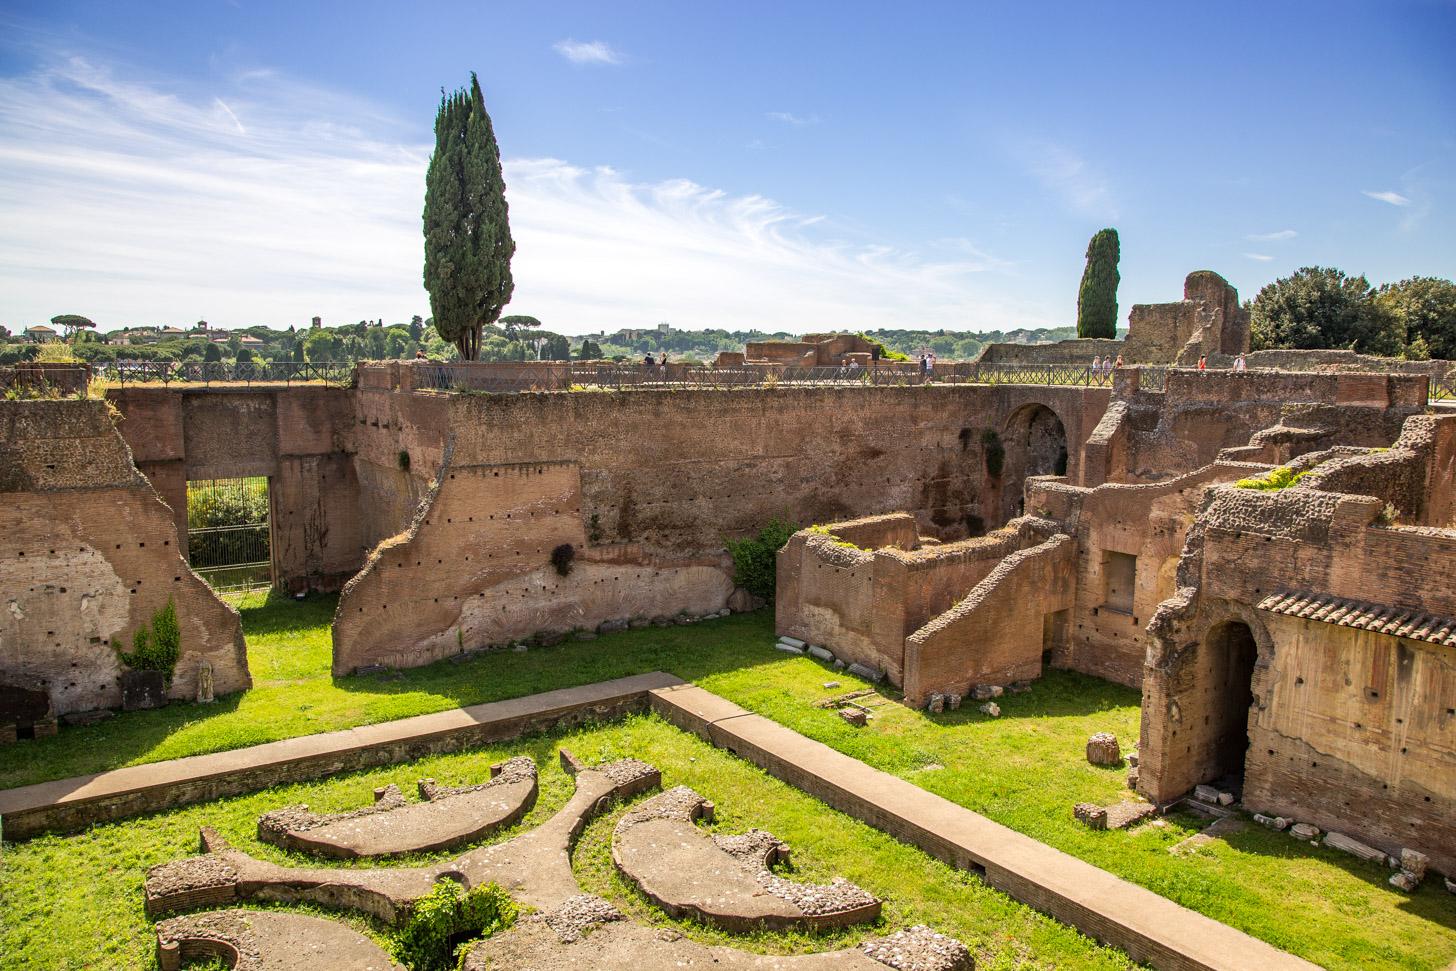 De Palatijnse heuvel